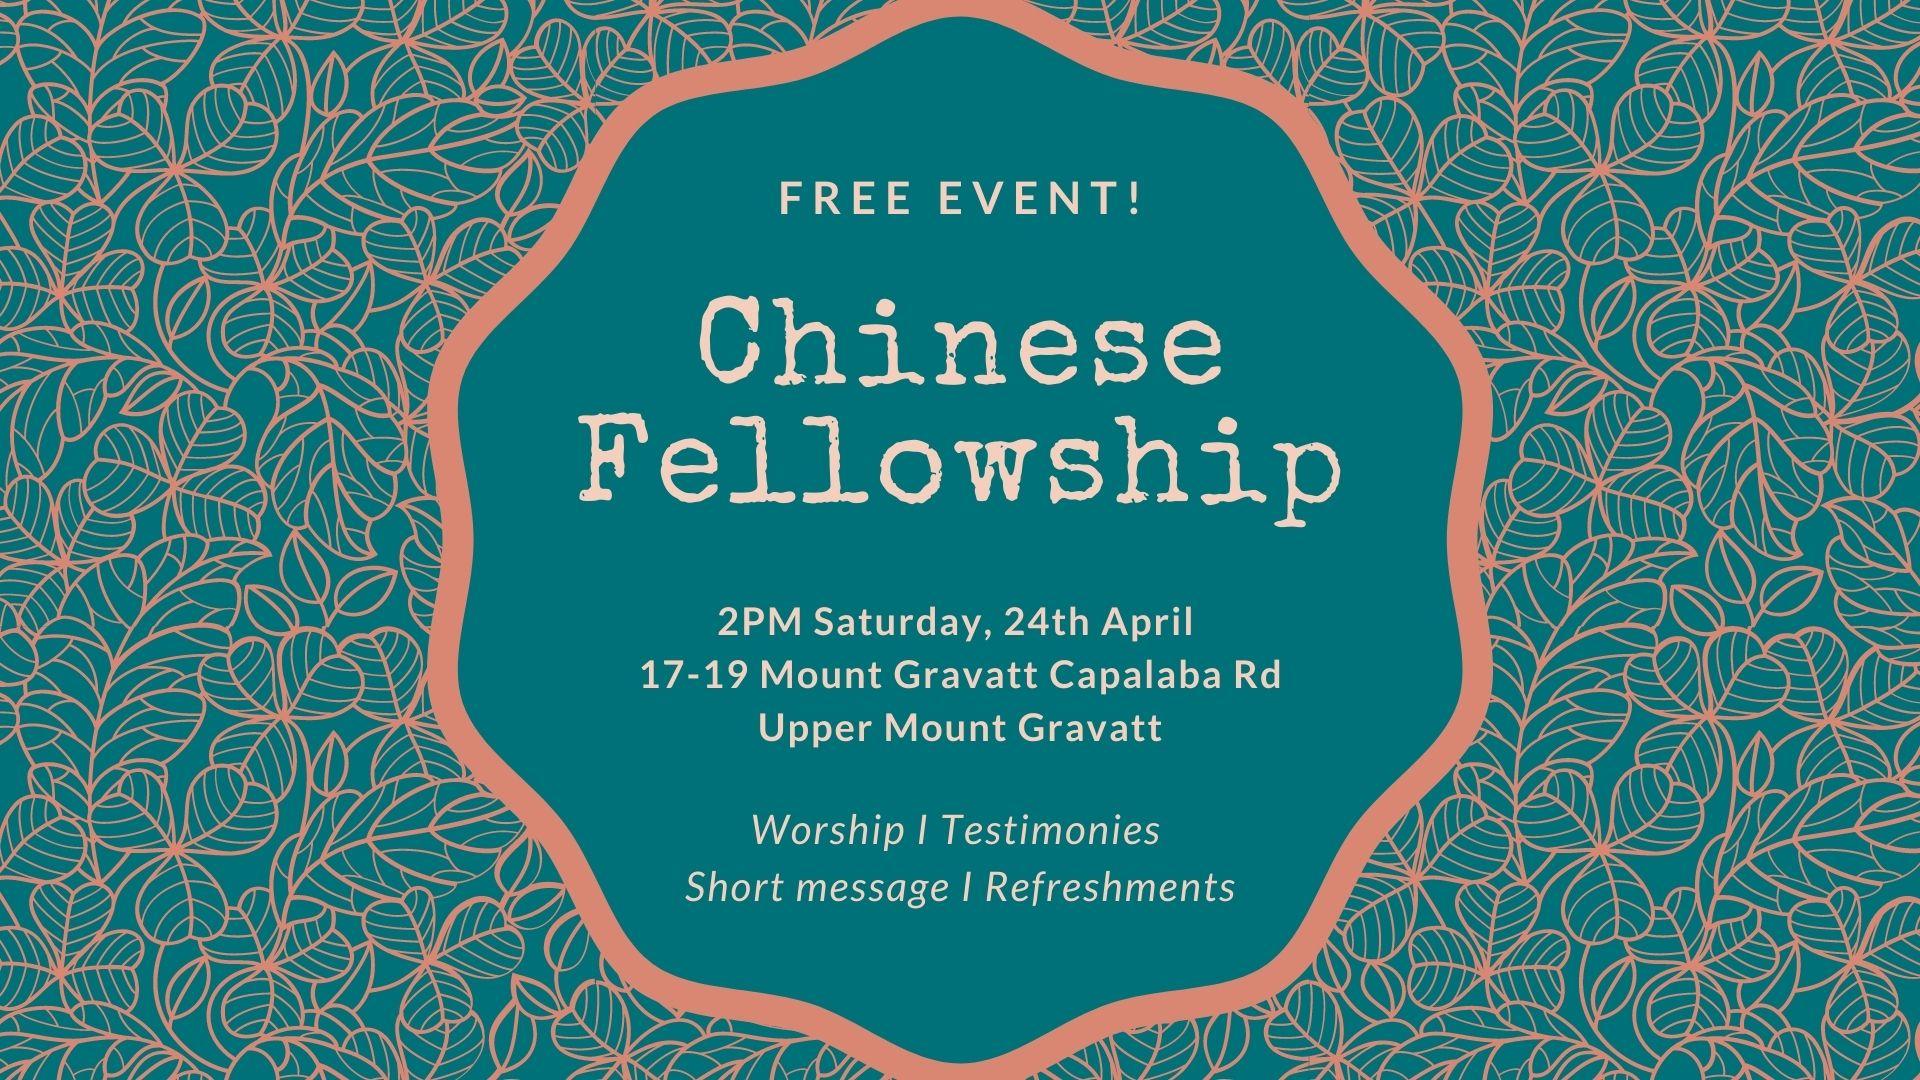 Chinese Fellowship